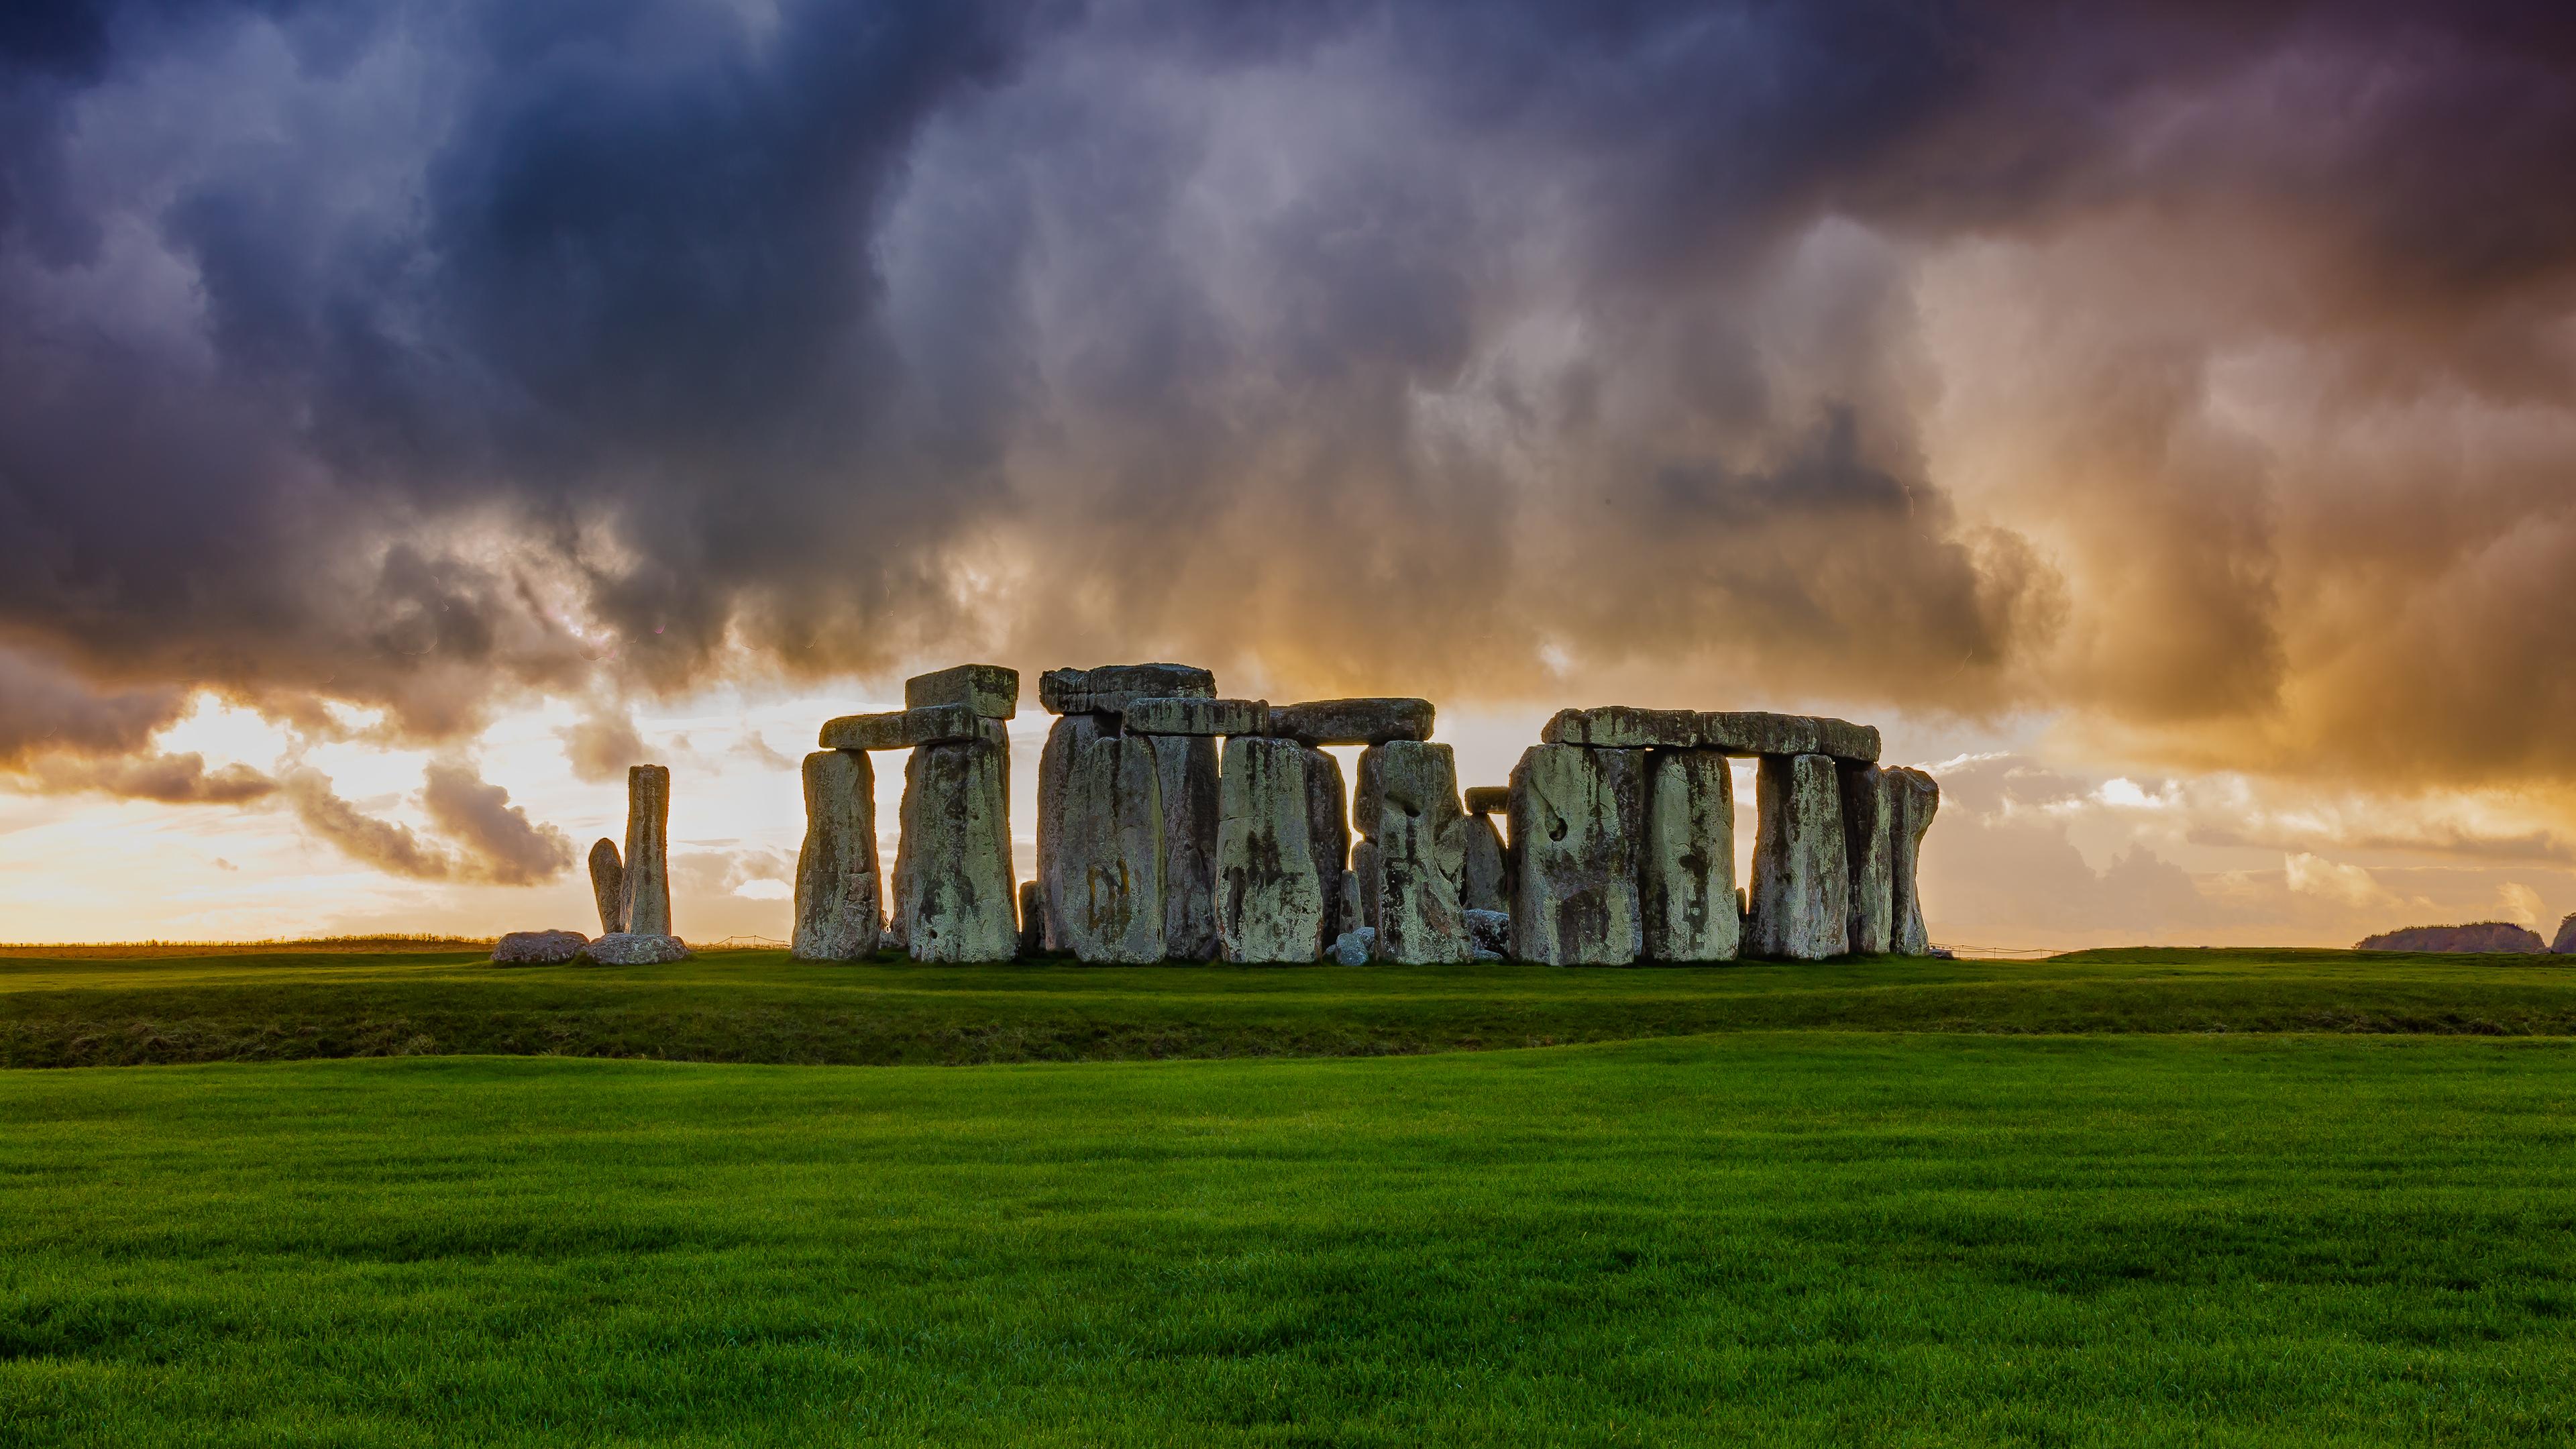 Stonehenge 4k Ultra HD Wallpaper Background Image 3840x2160 3840x2160